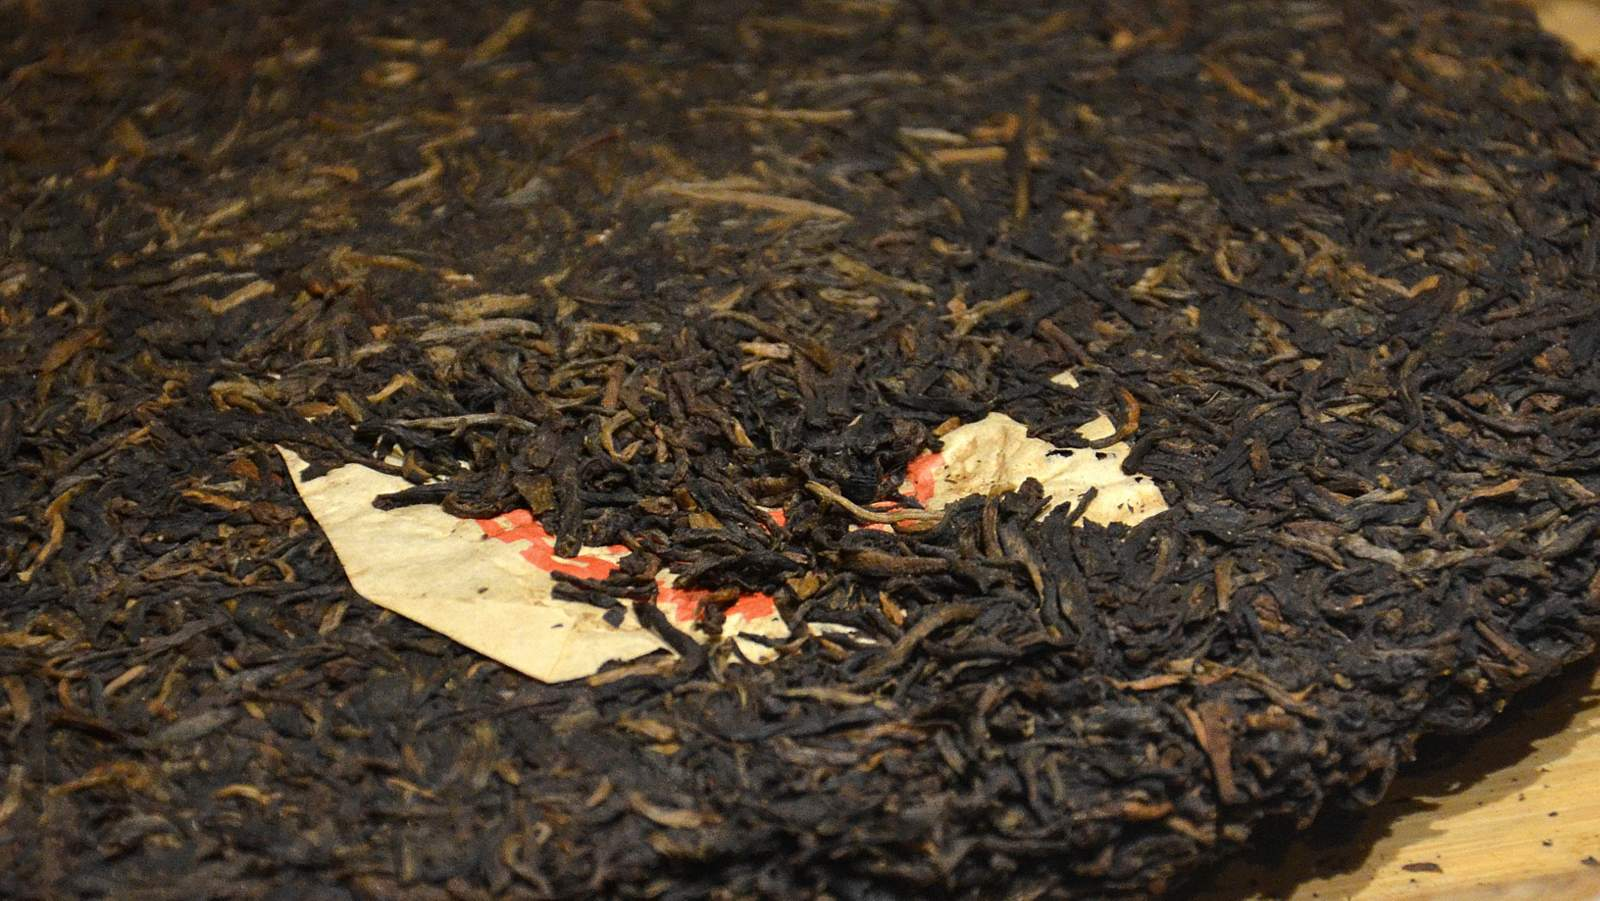 CNNP raw Pu-erh blend 7542, red label from 1996 of Menghai tea factory, small neifei